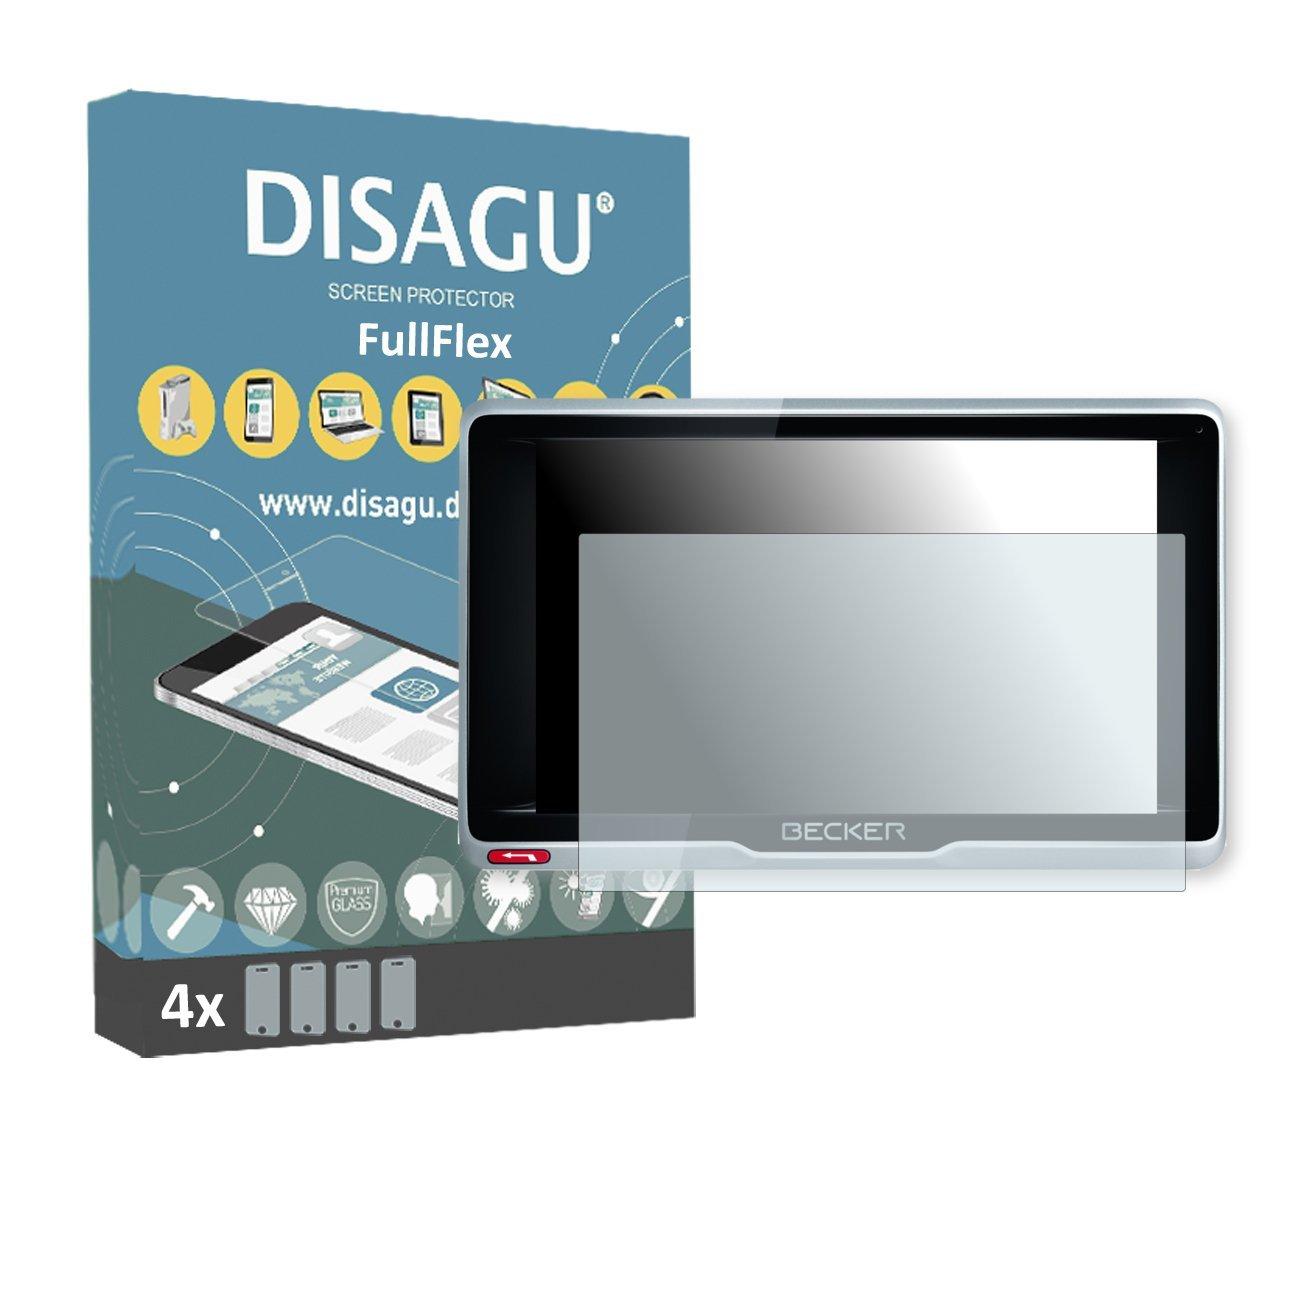 4 x Disagu FullFlex screen protector for Becker Active.6 LMU plus foil screen protector